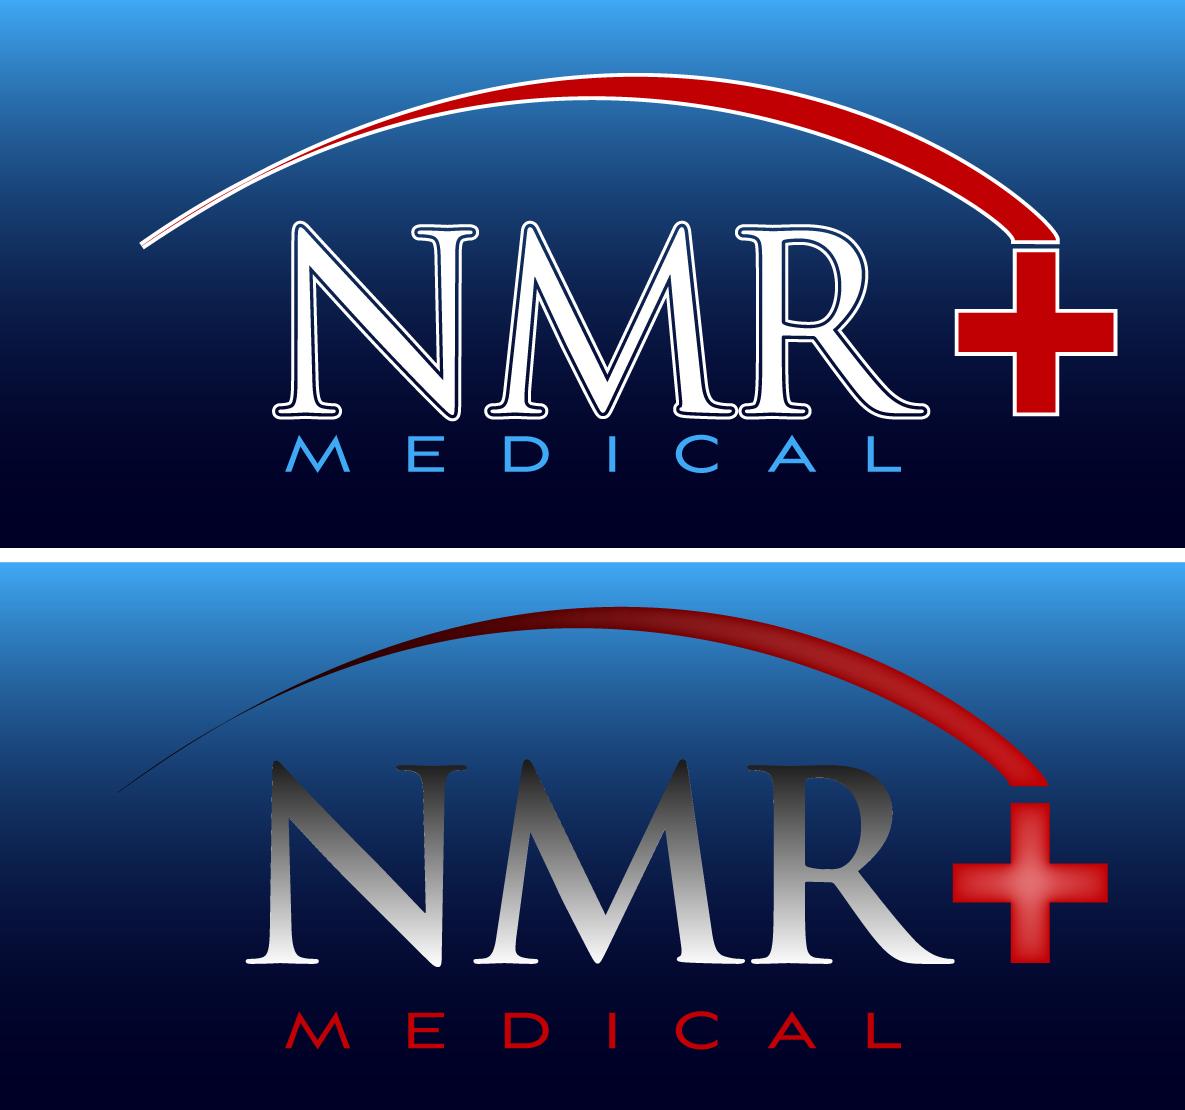 NMR Medical, Inc. needs a new logo